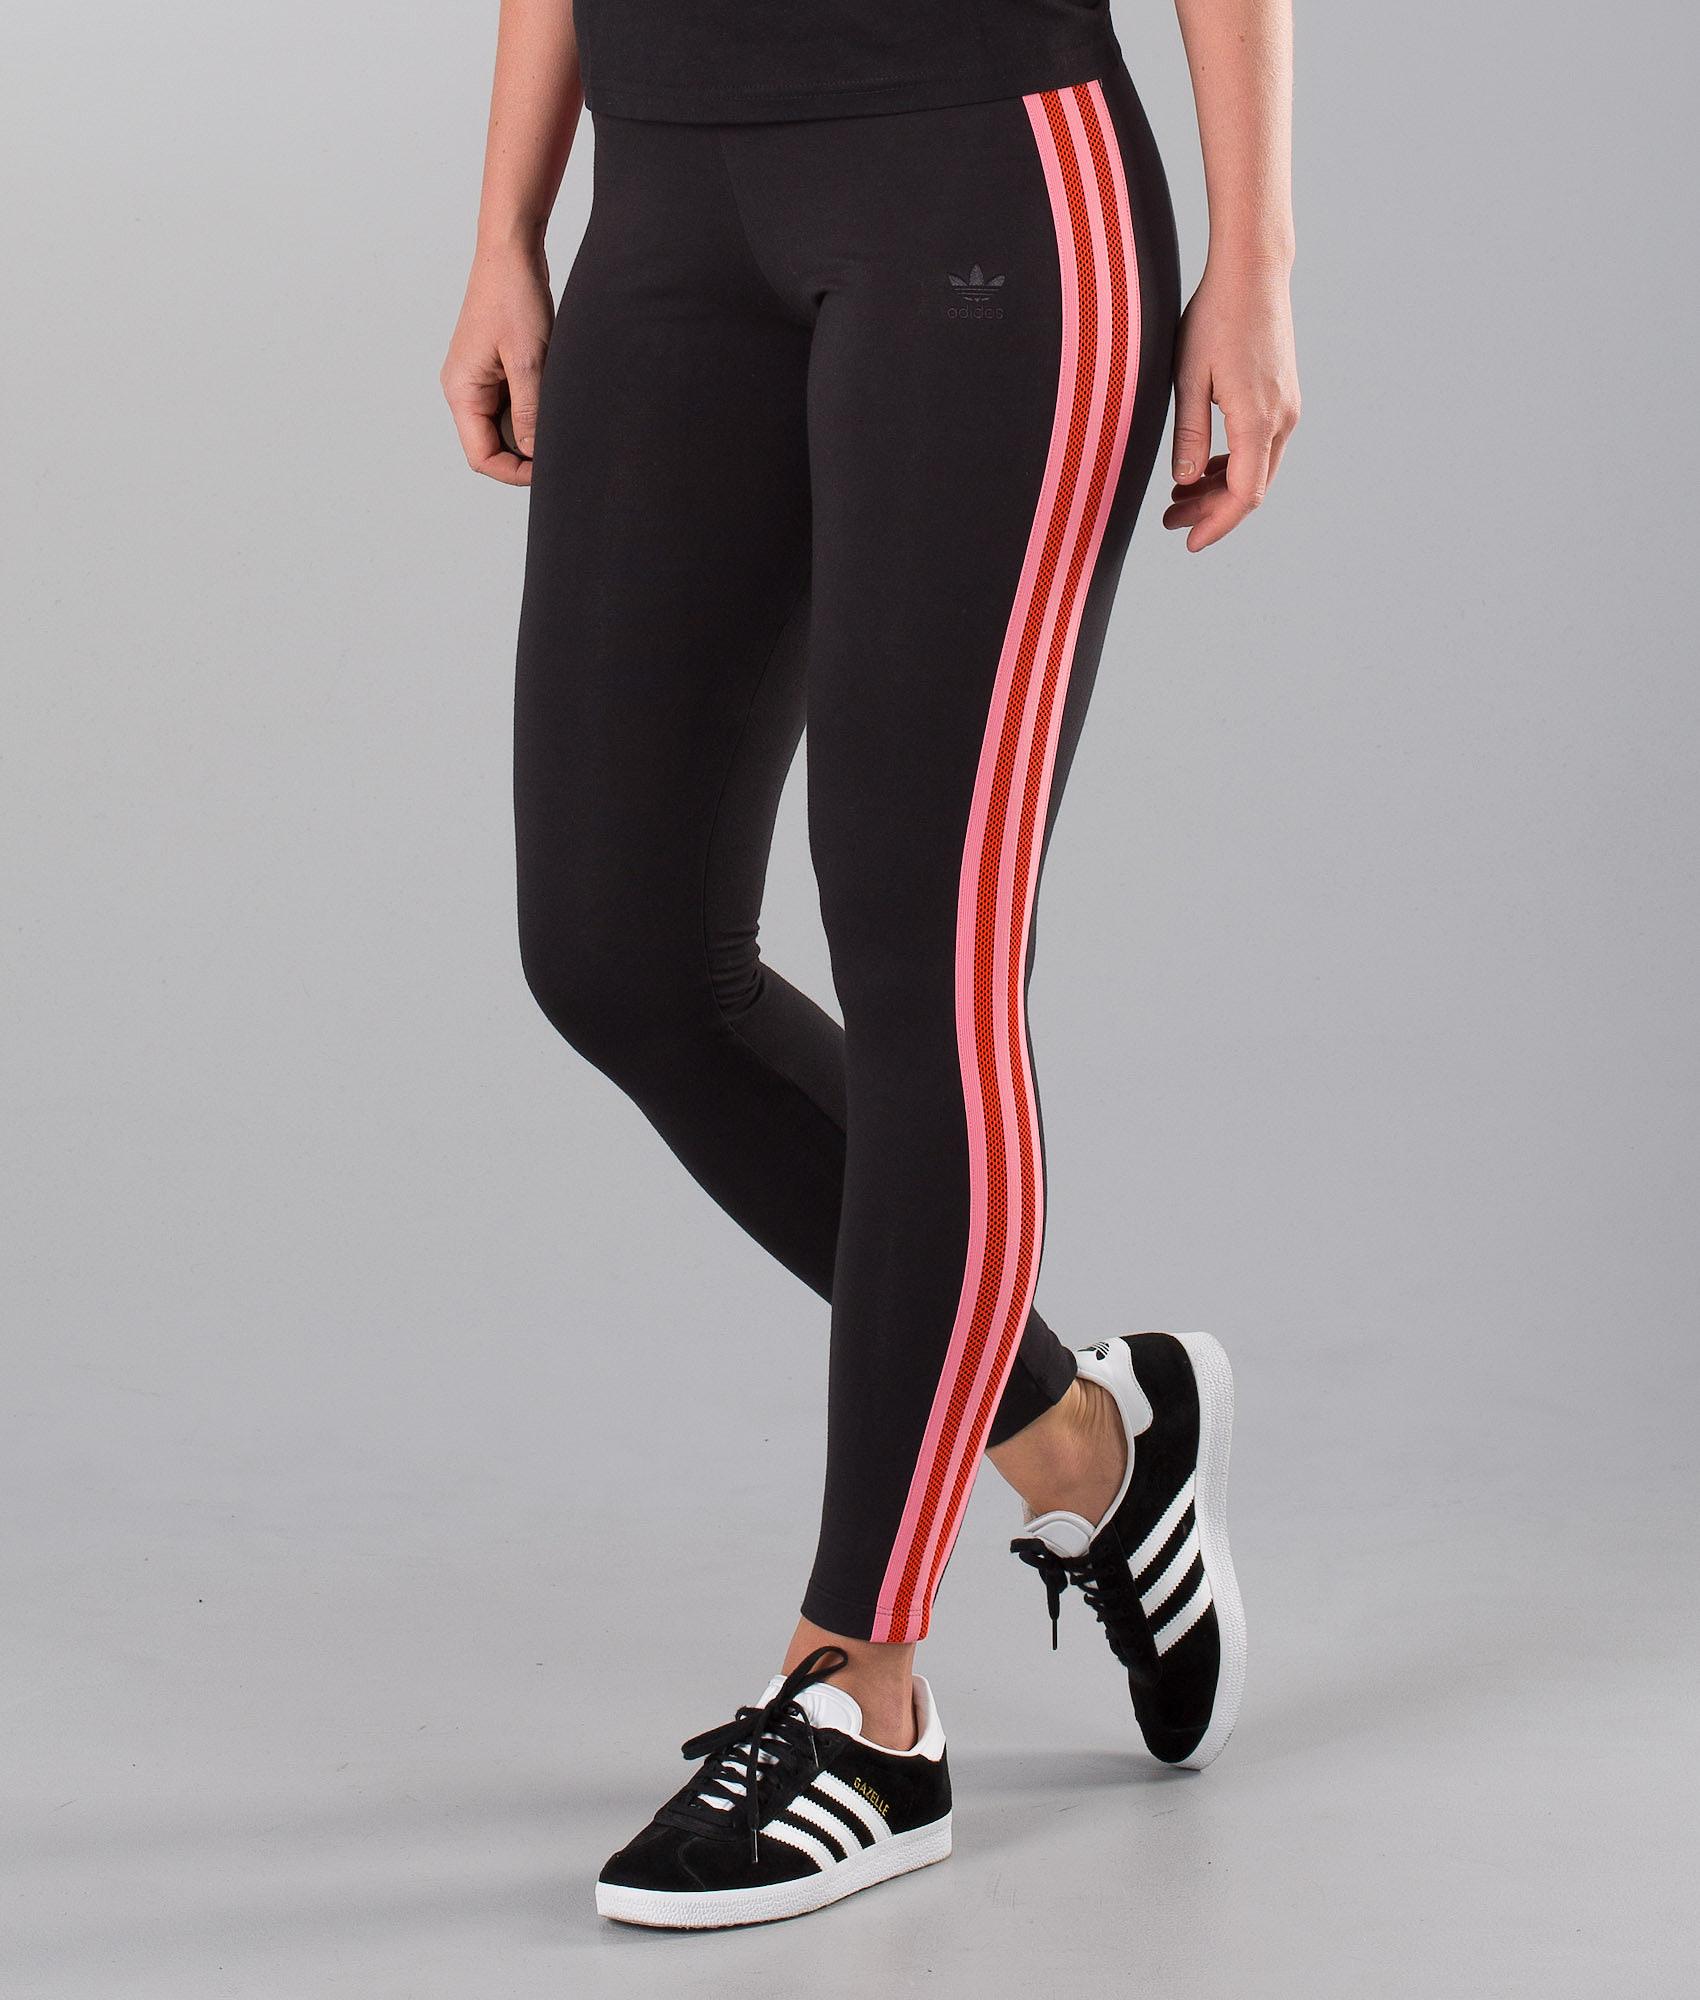 48f48c51b0b Adidas Originals Clrdo Leggings Black - Ridestore.com